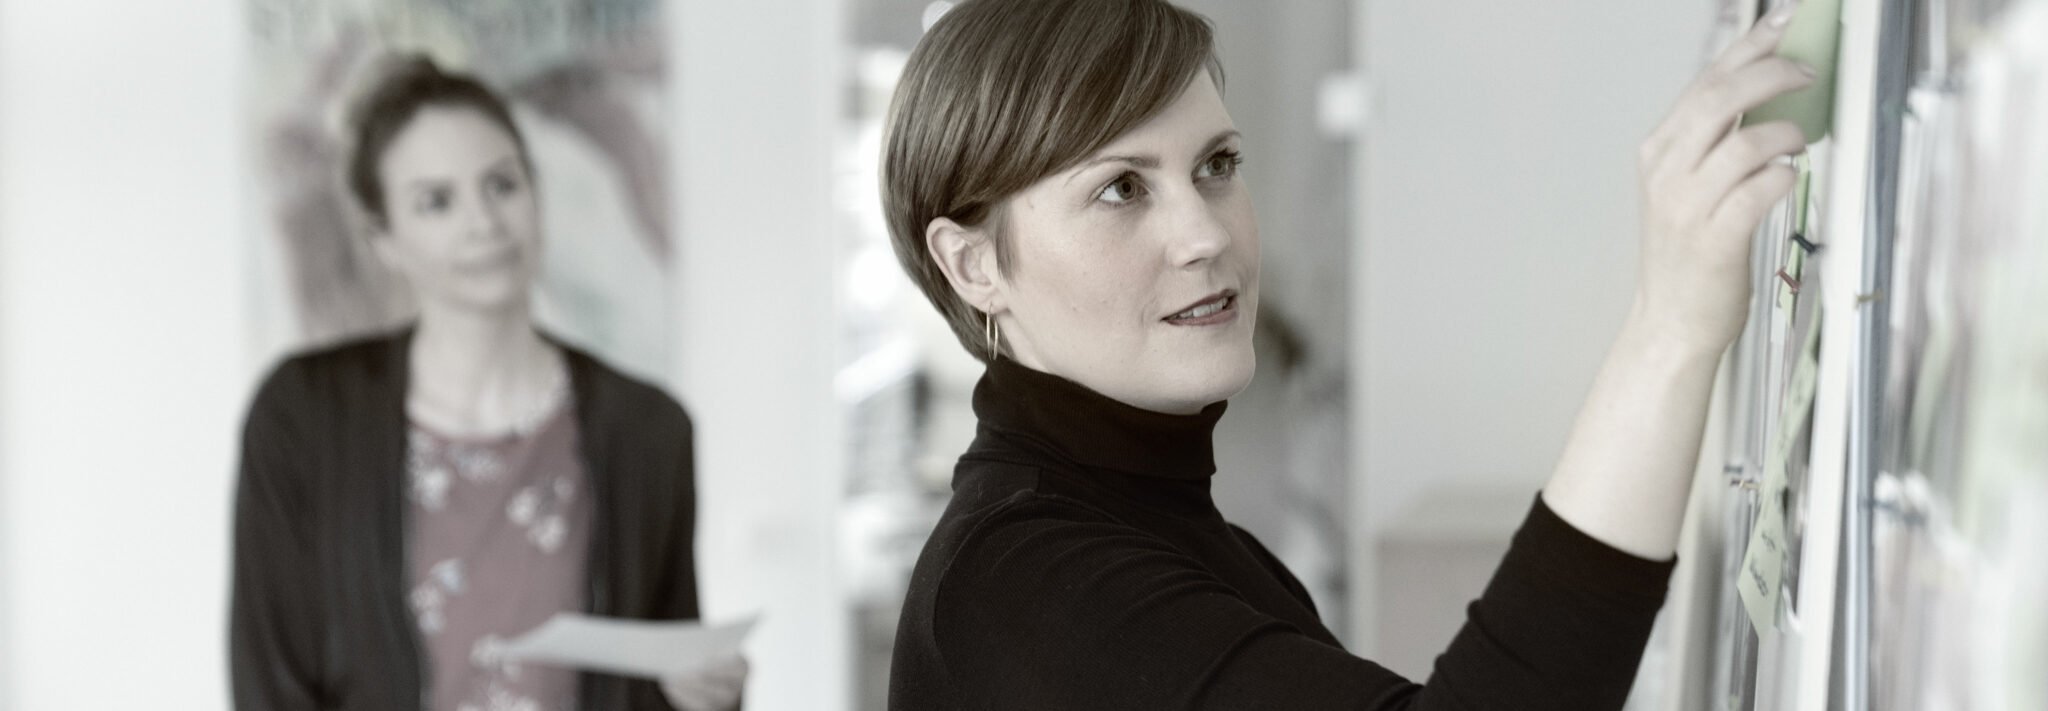 Zwei Frauen am Whiteboard